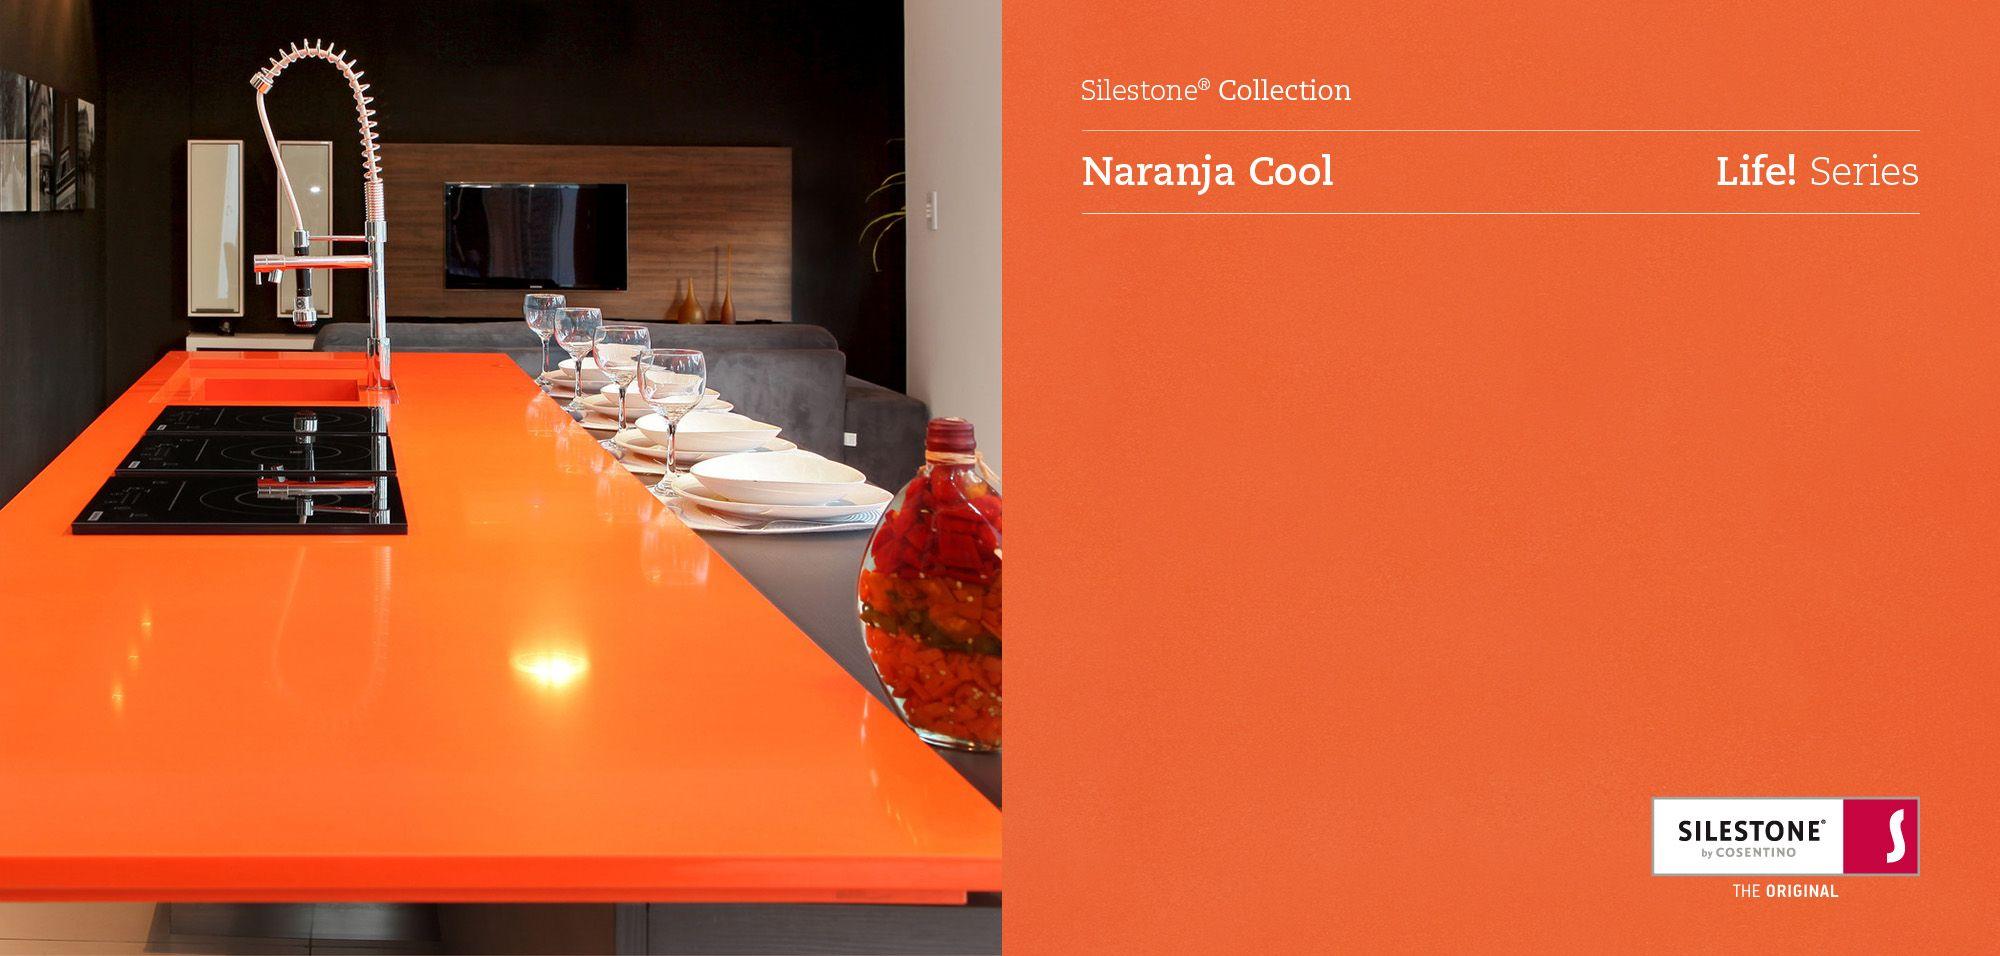 Encimera Silestone Naranja Cool